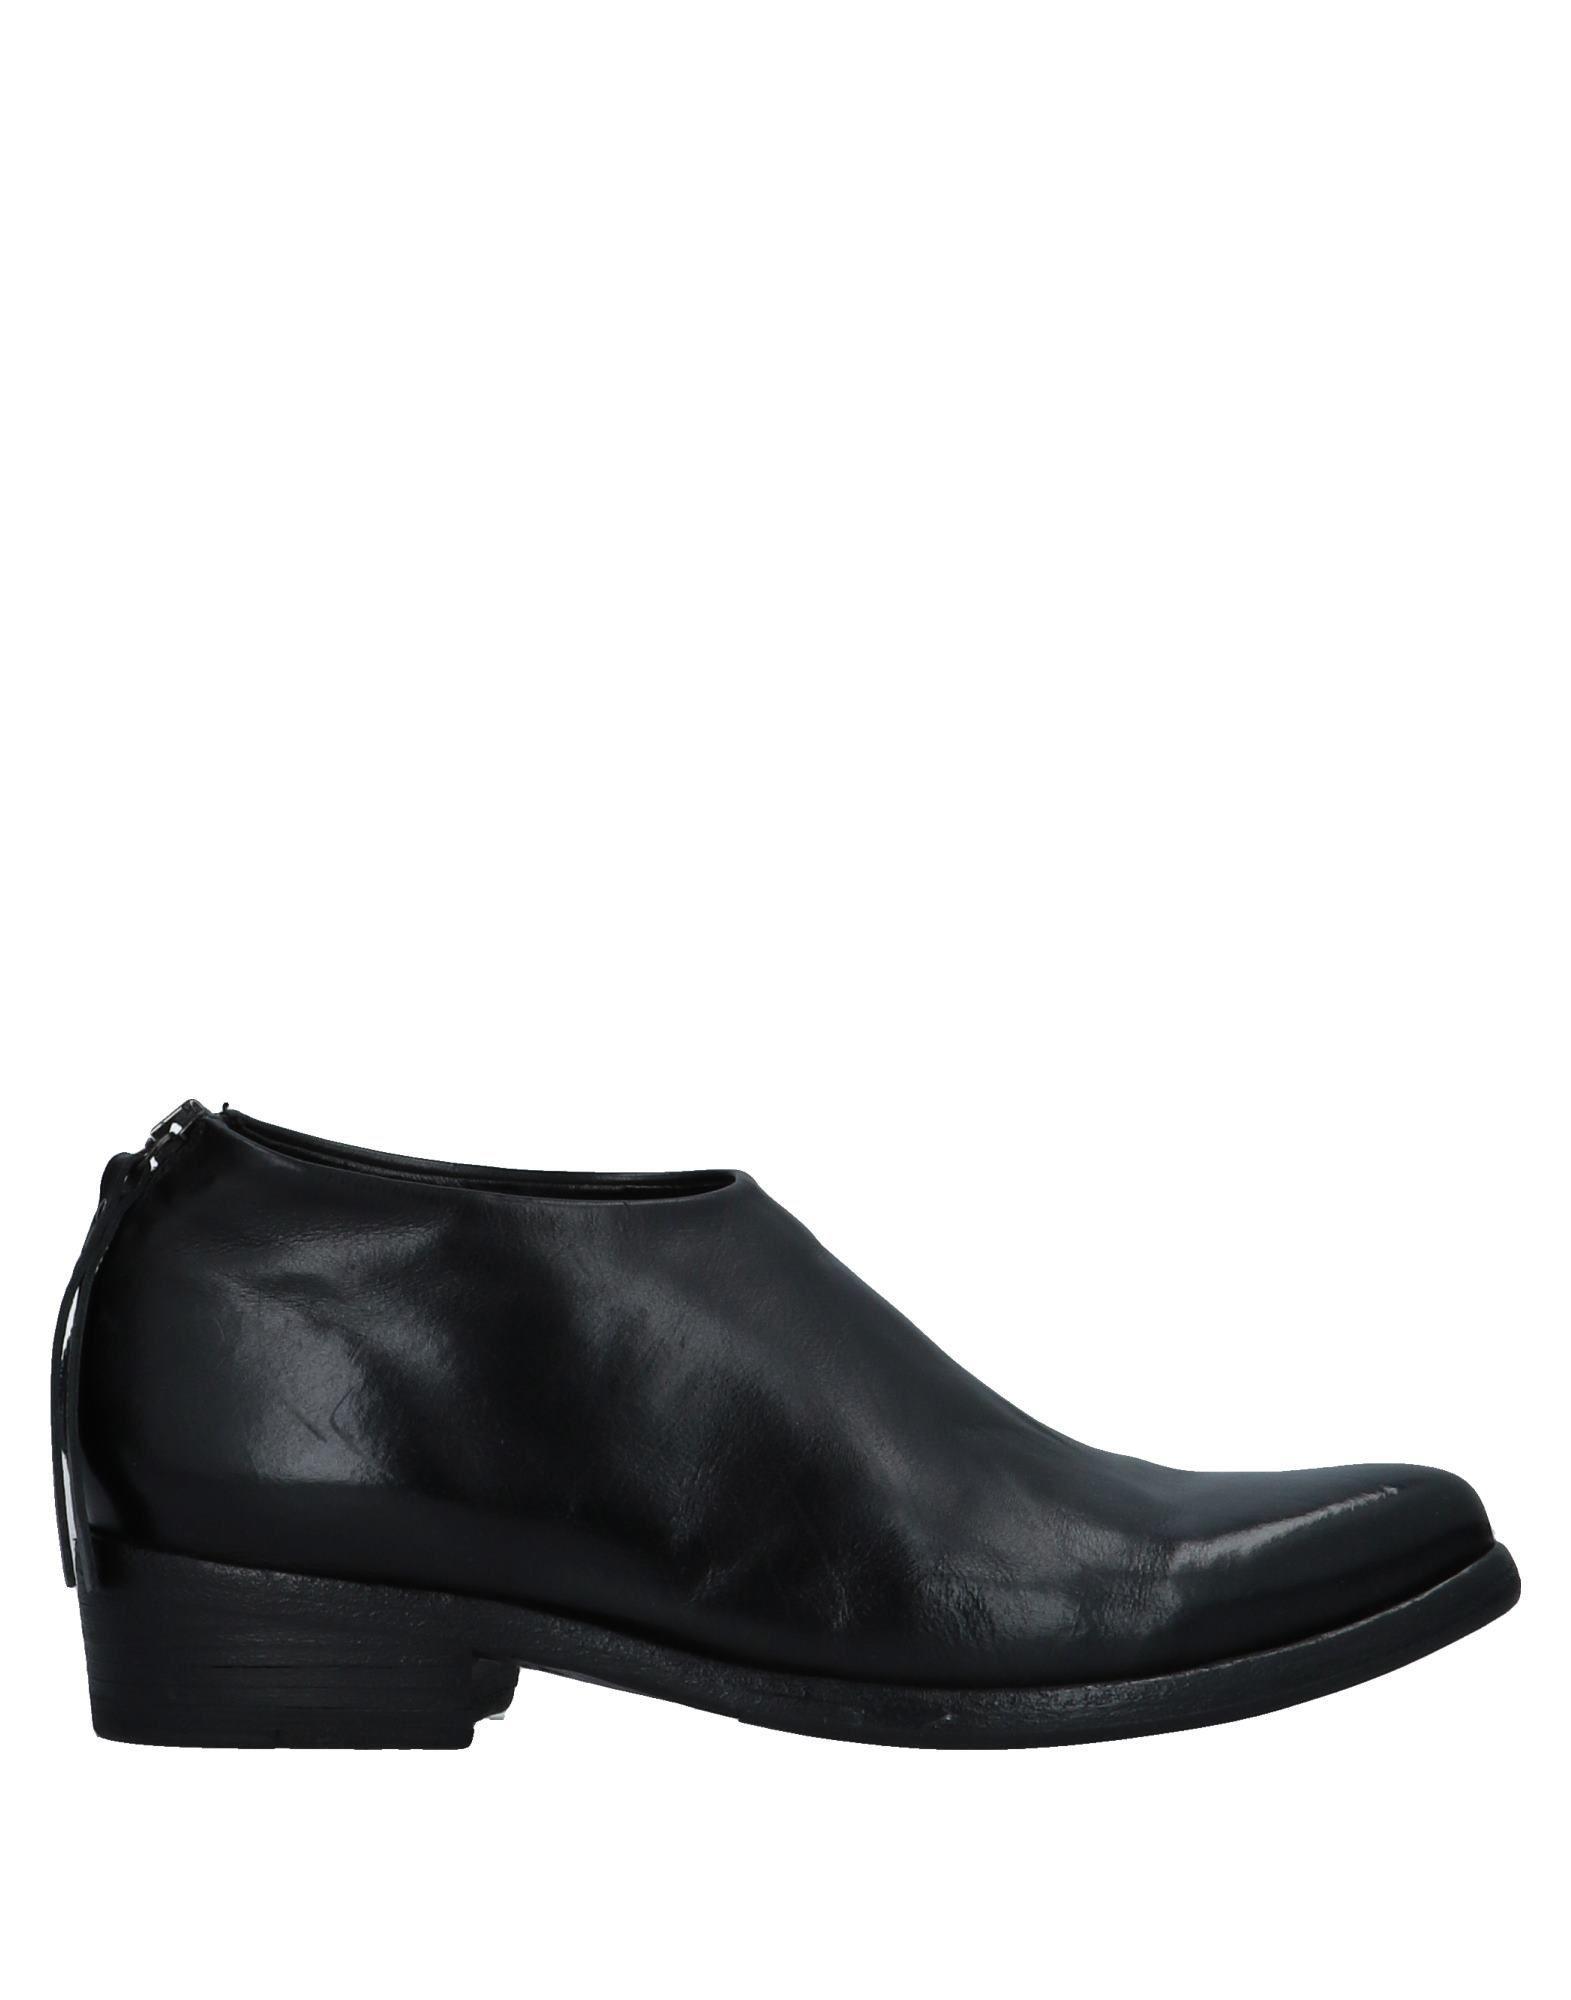 Sartori Gold Ankle Boot - Women online Sartori Gold Ankle Boots online Women on  Australia - 11534043GR 9b74ff